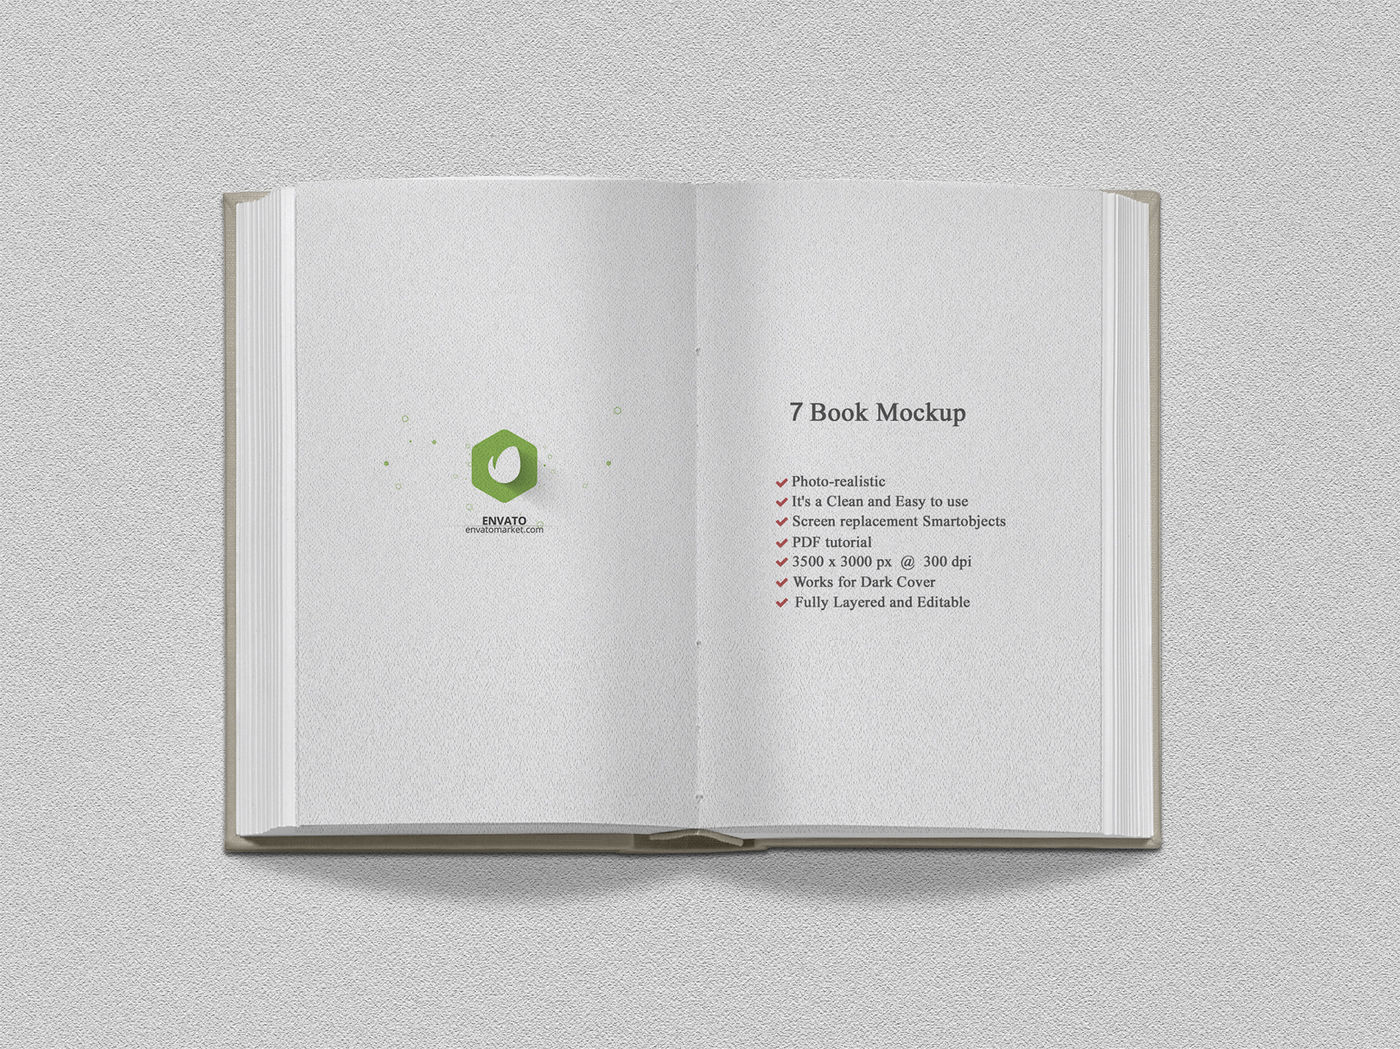 Book Mockup Psd Free Download